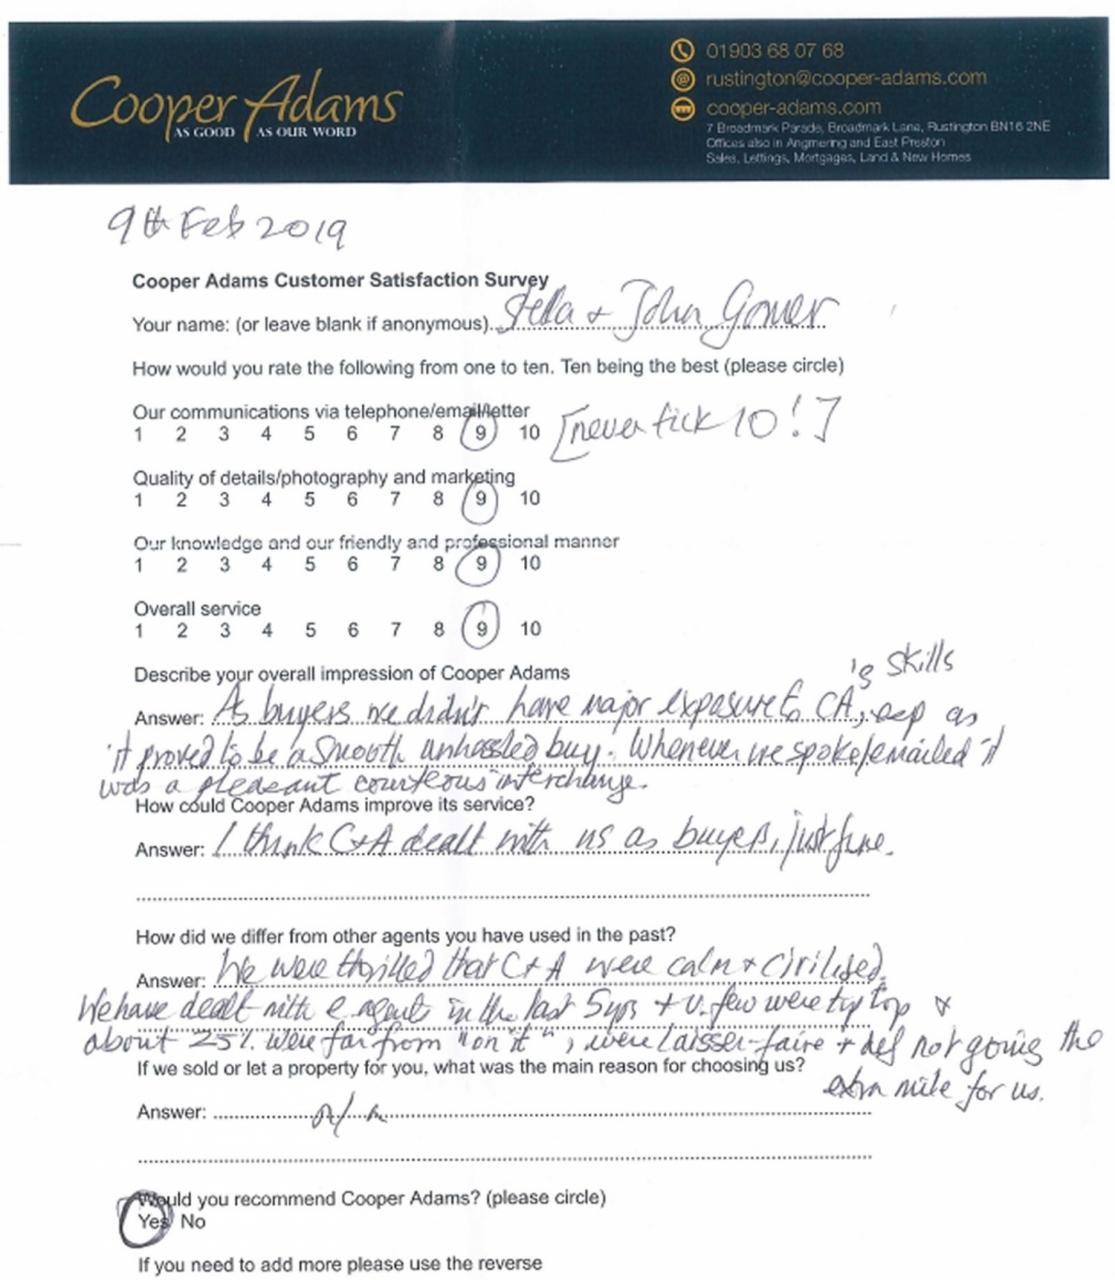 Customer satisfaction survey from Mr & Mrs Gomer